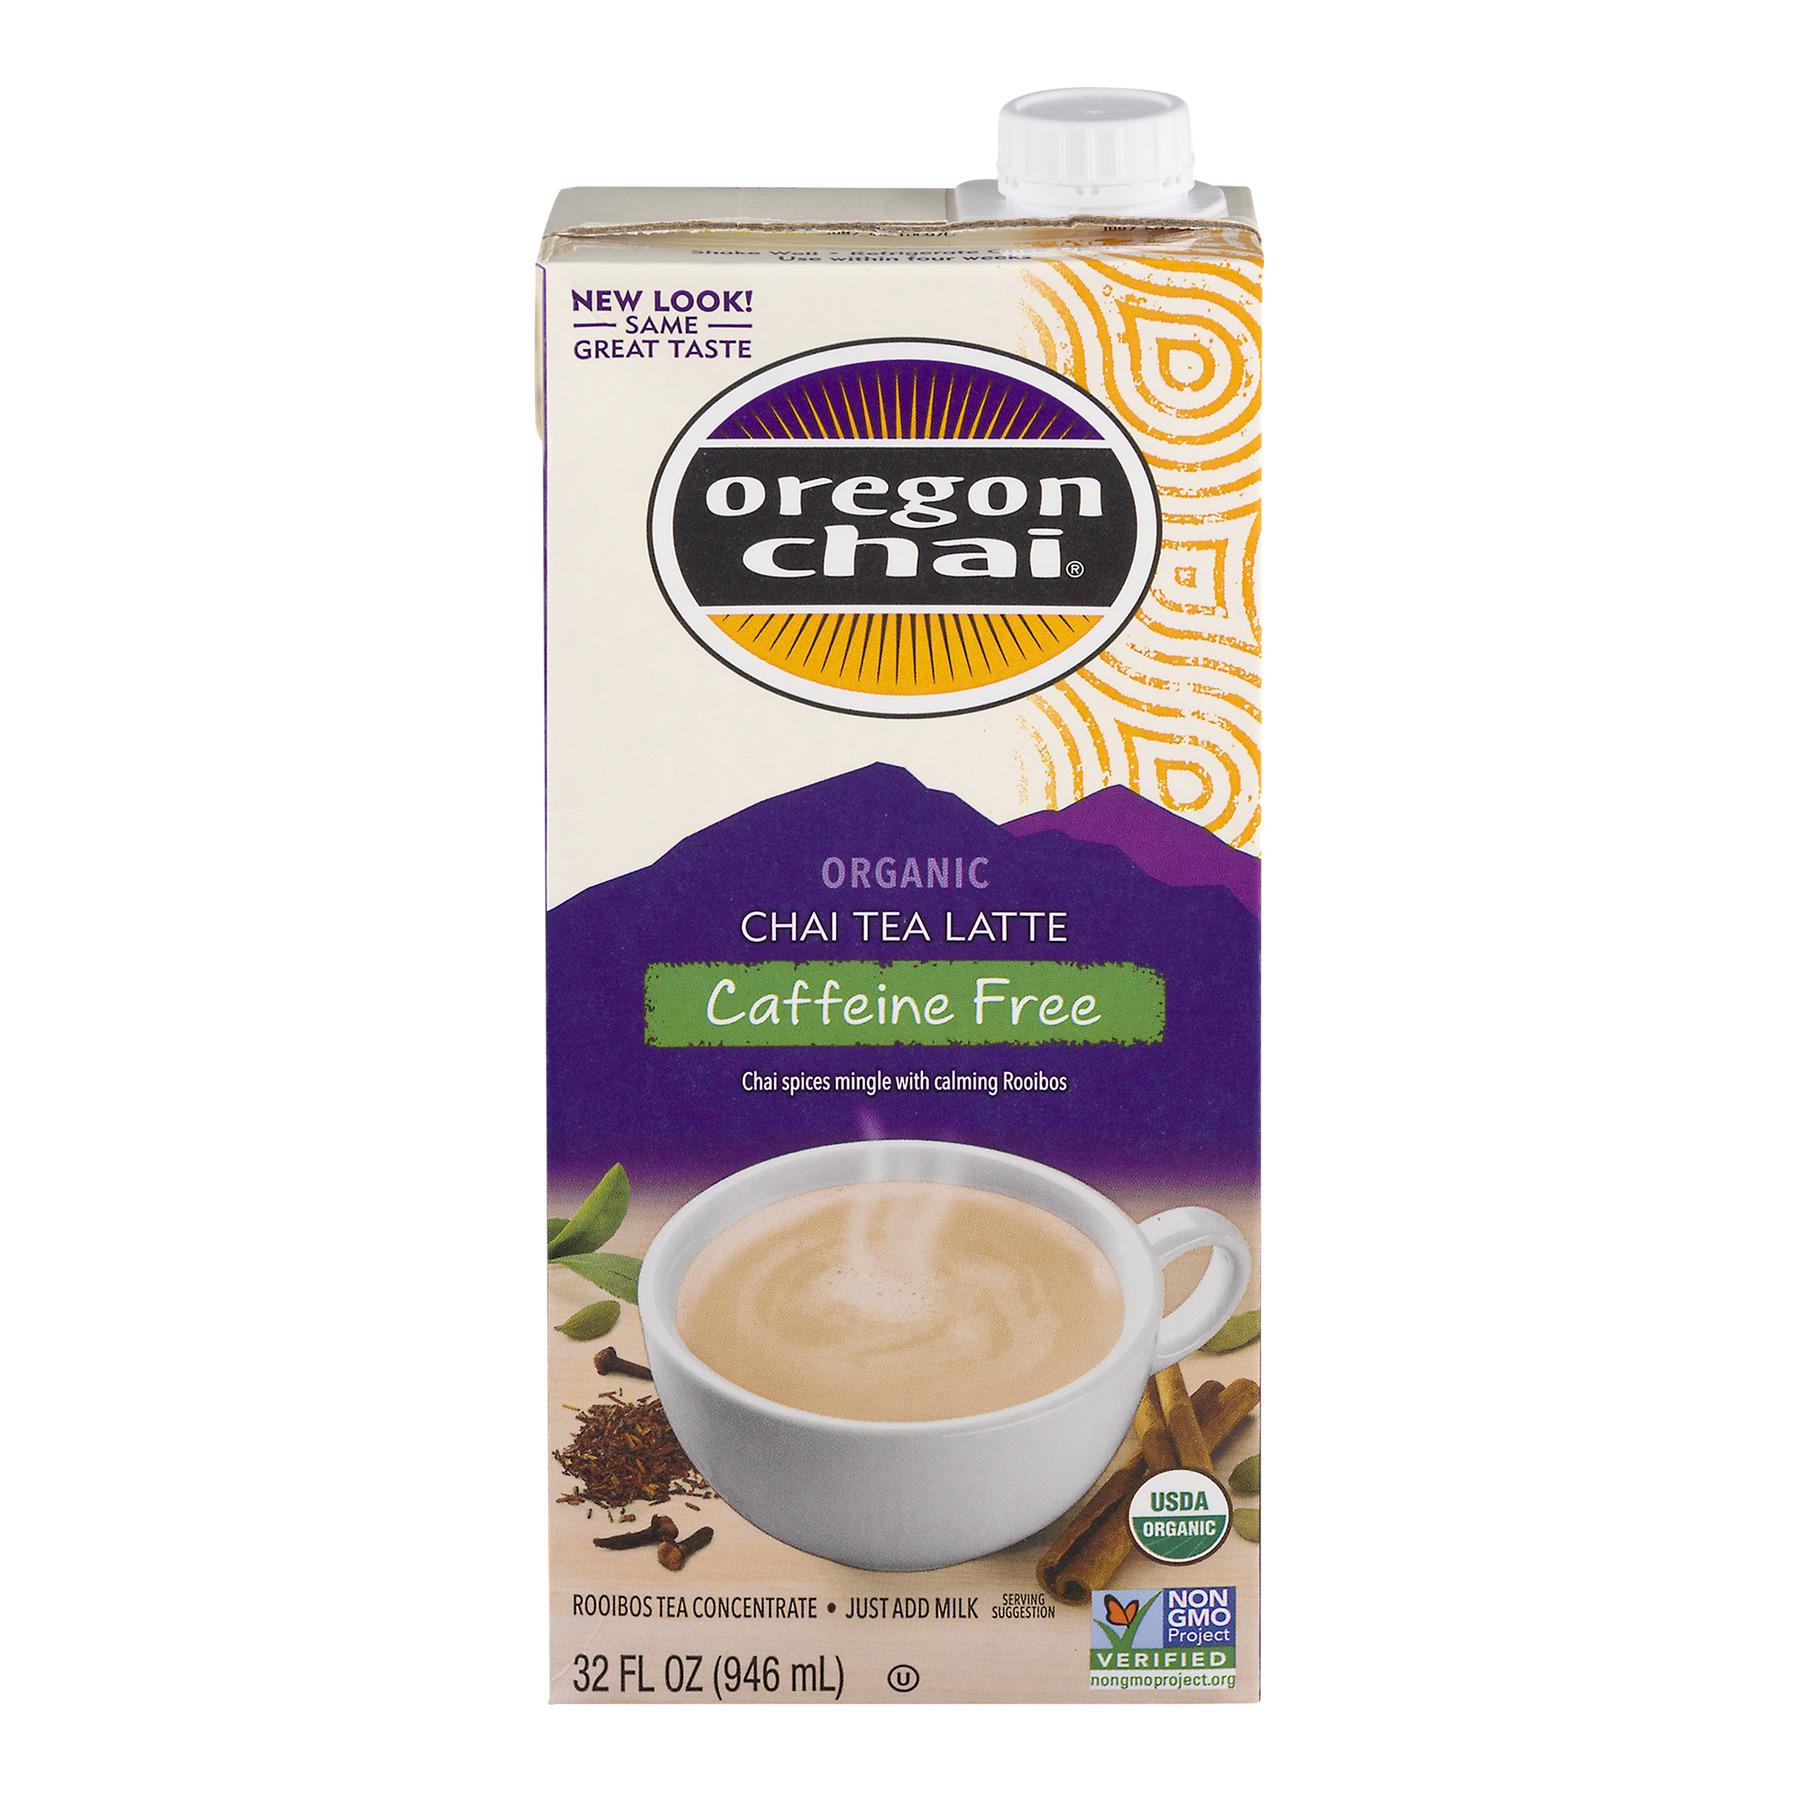 Oregon Chai Organic Chai Tea Latte Caffeine Free, 32.0 FL OZ